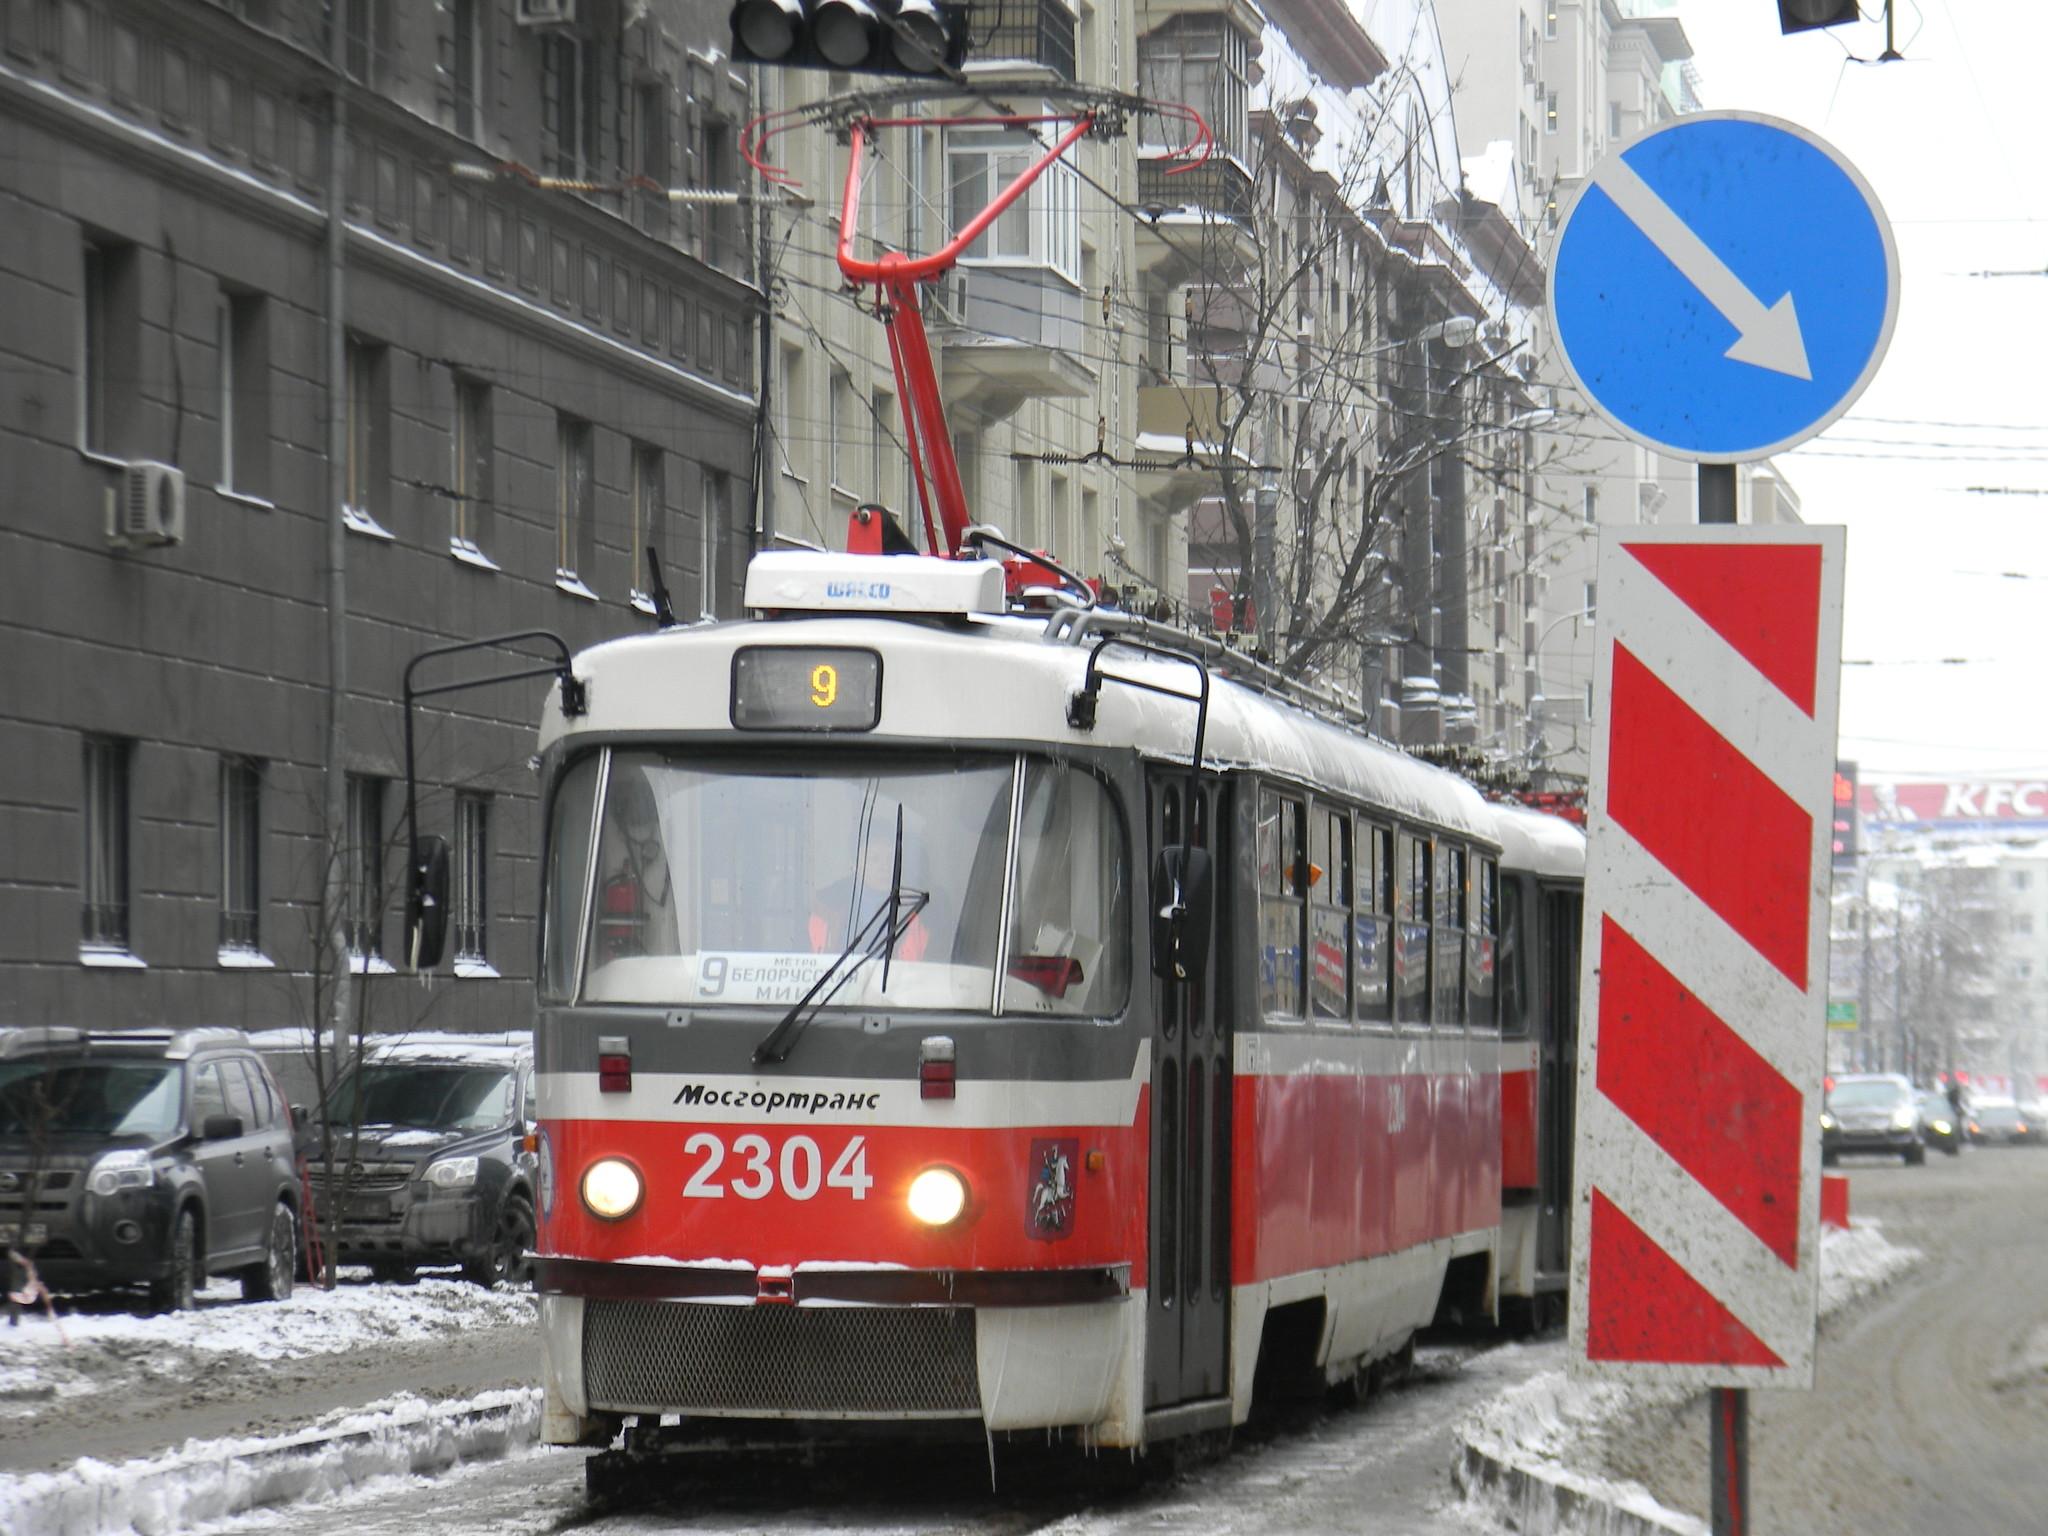 Трамвайный маршрут № 9 от станции метро